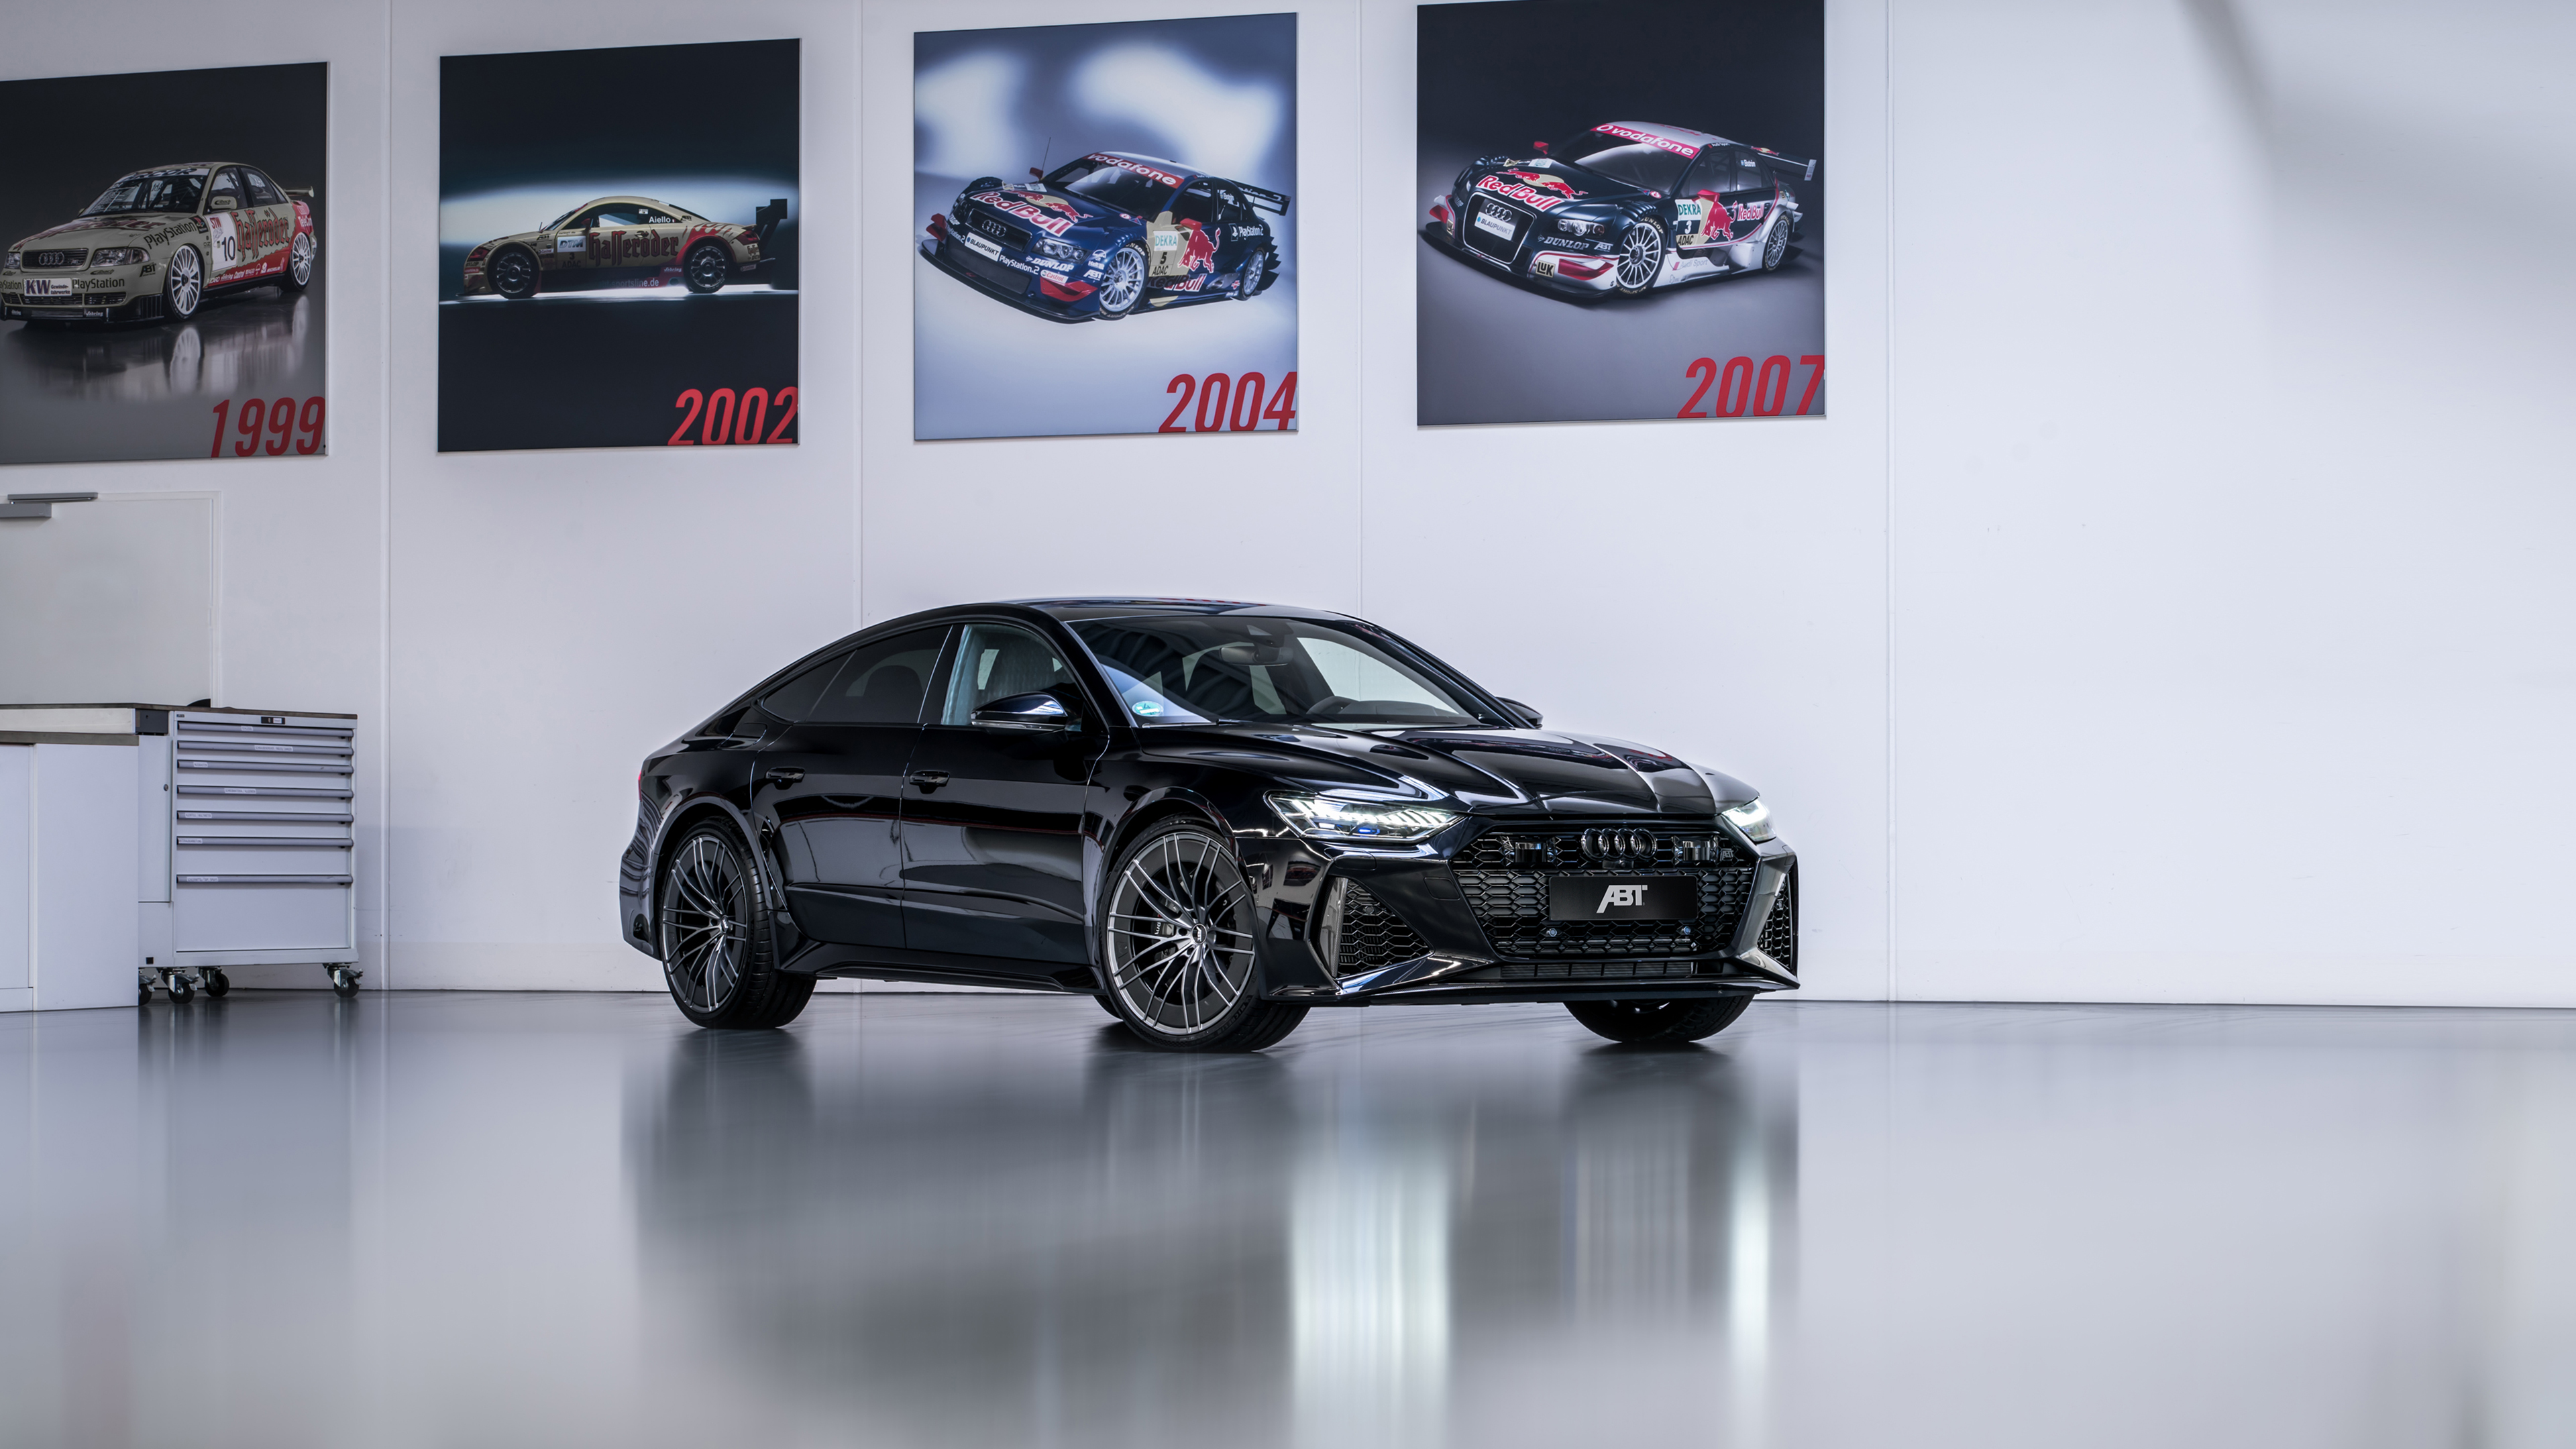 Abt Audi Rs 7 Sportback 2020 4k 3 Wallpaper Hd Car Wallpapers Id 14164